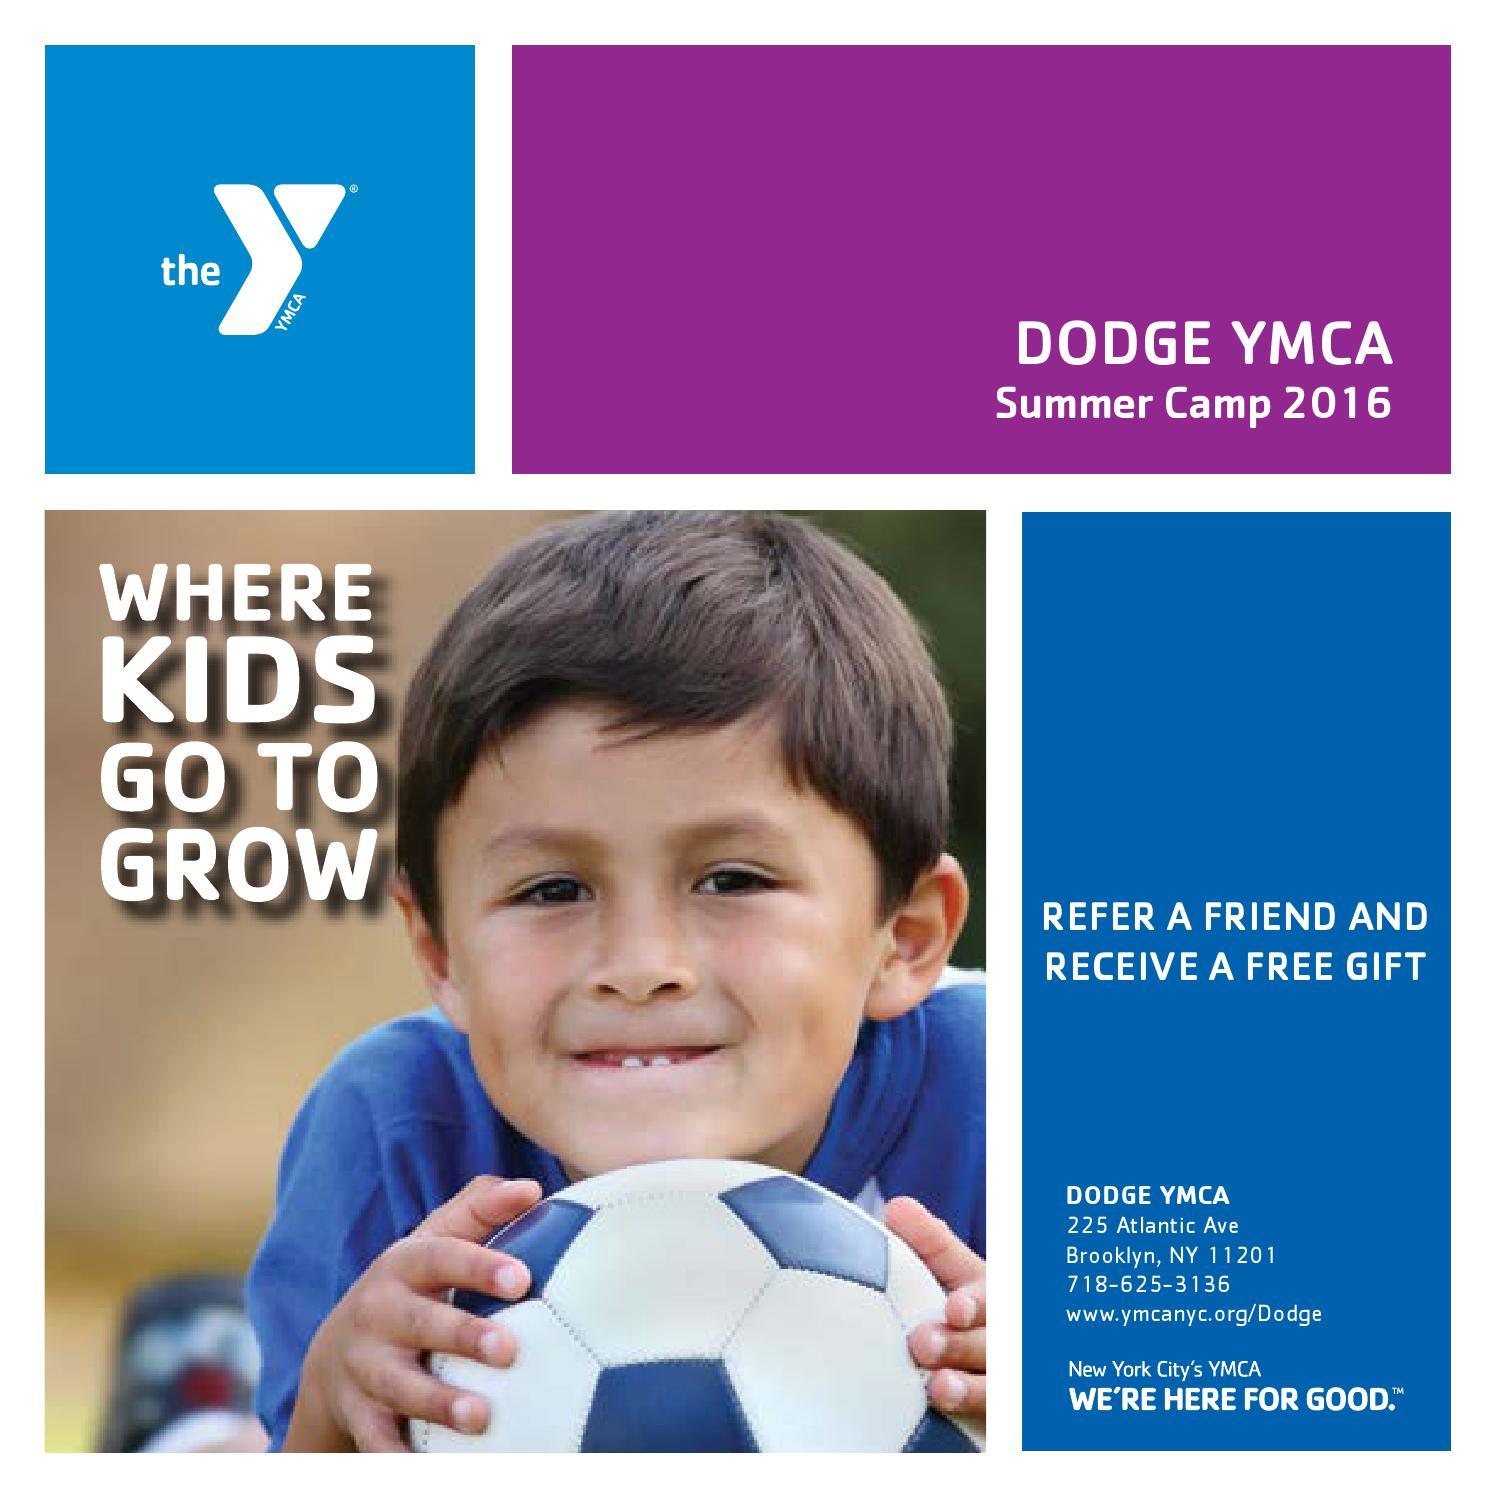 dodge ymca  summer camp brochure   york citys ymca issuu